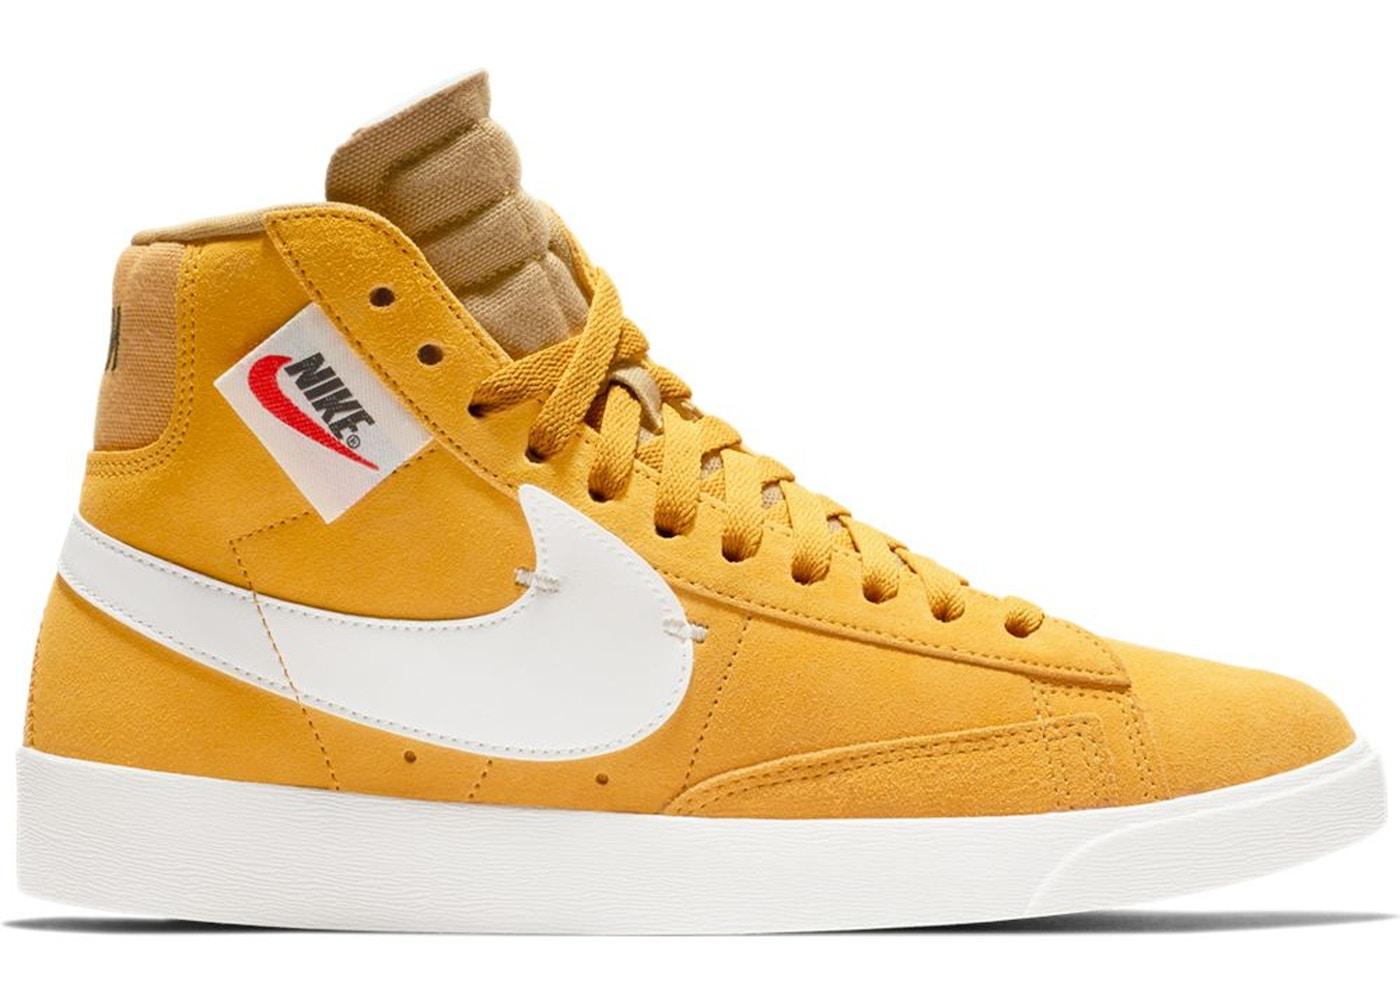 Nike Blazer Mid Rebel Yellow Ochre (W)